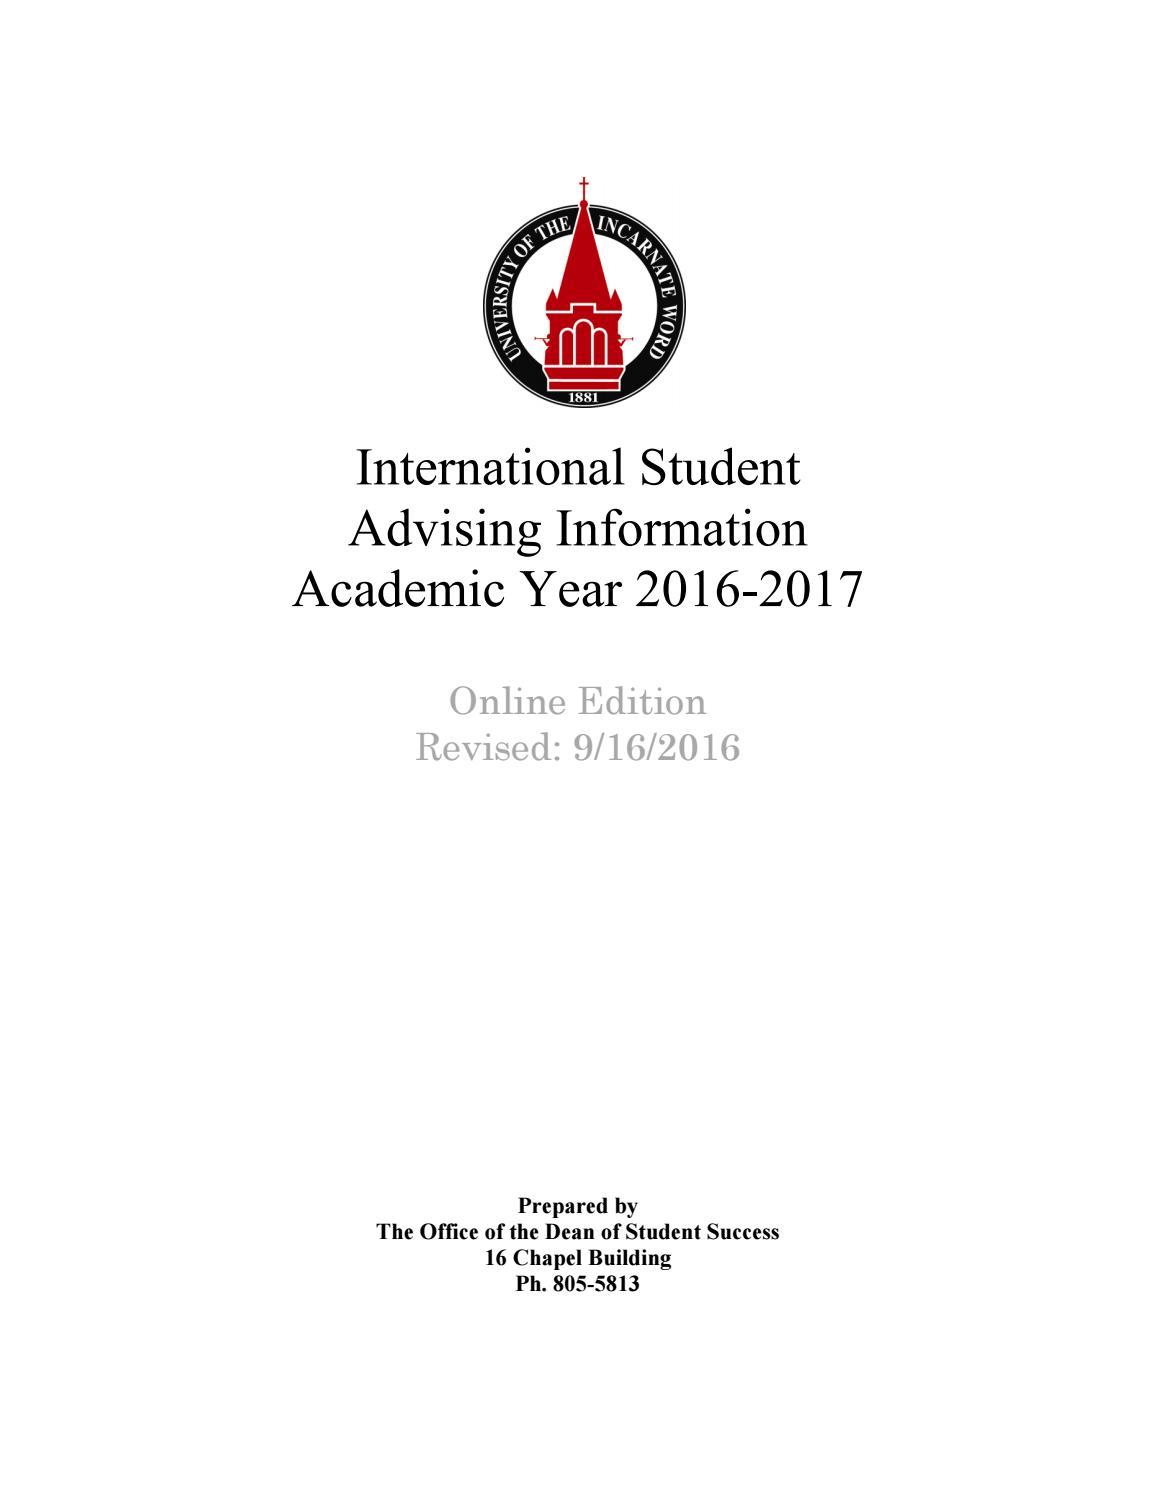 Undergrad Int'l Advising 16-17 by UIW International